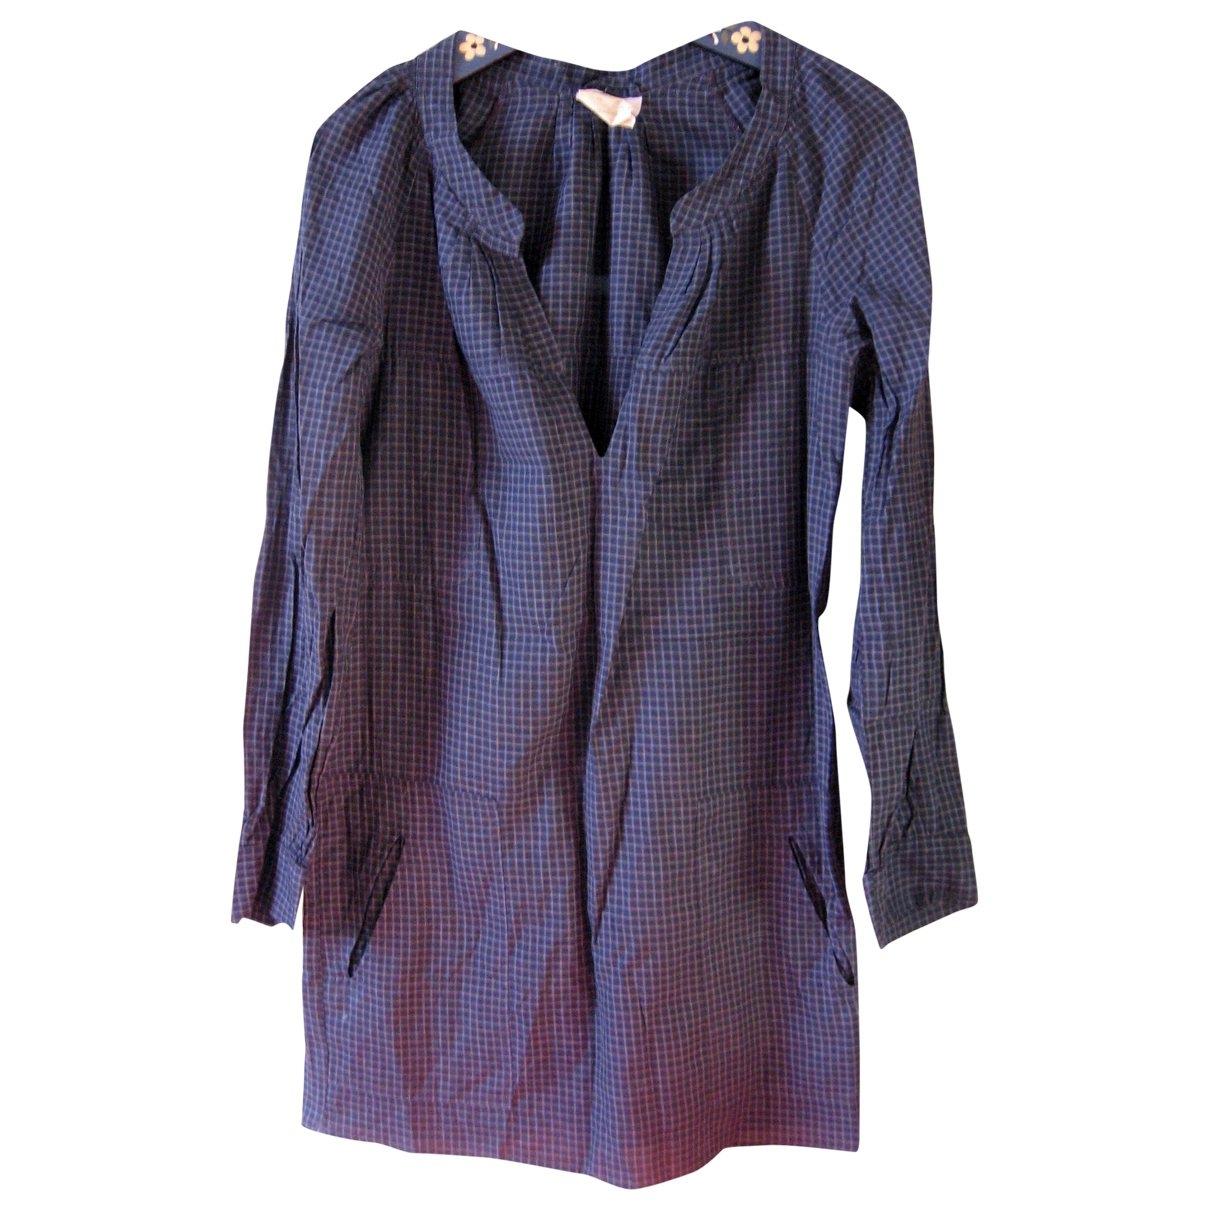 Isabel Marant Etoile \N Blue Cotton dress for Women 1 0-5